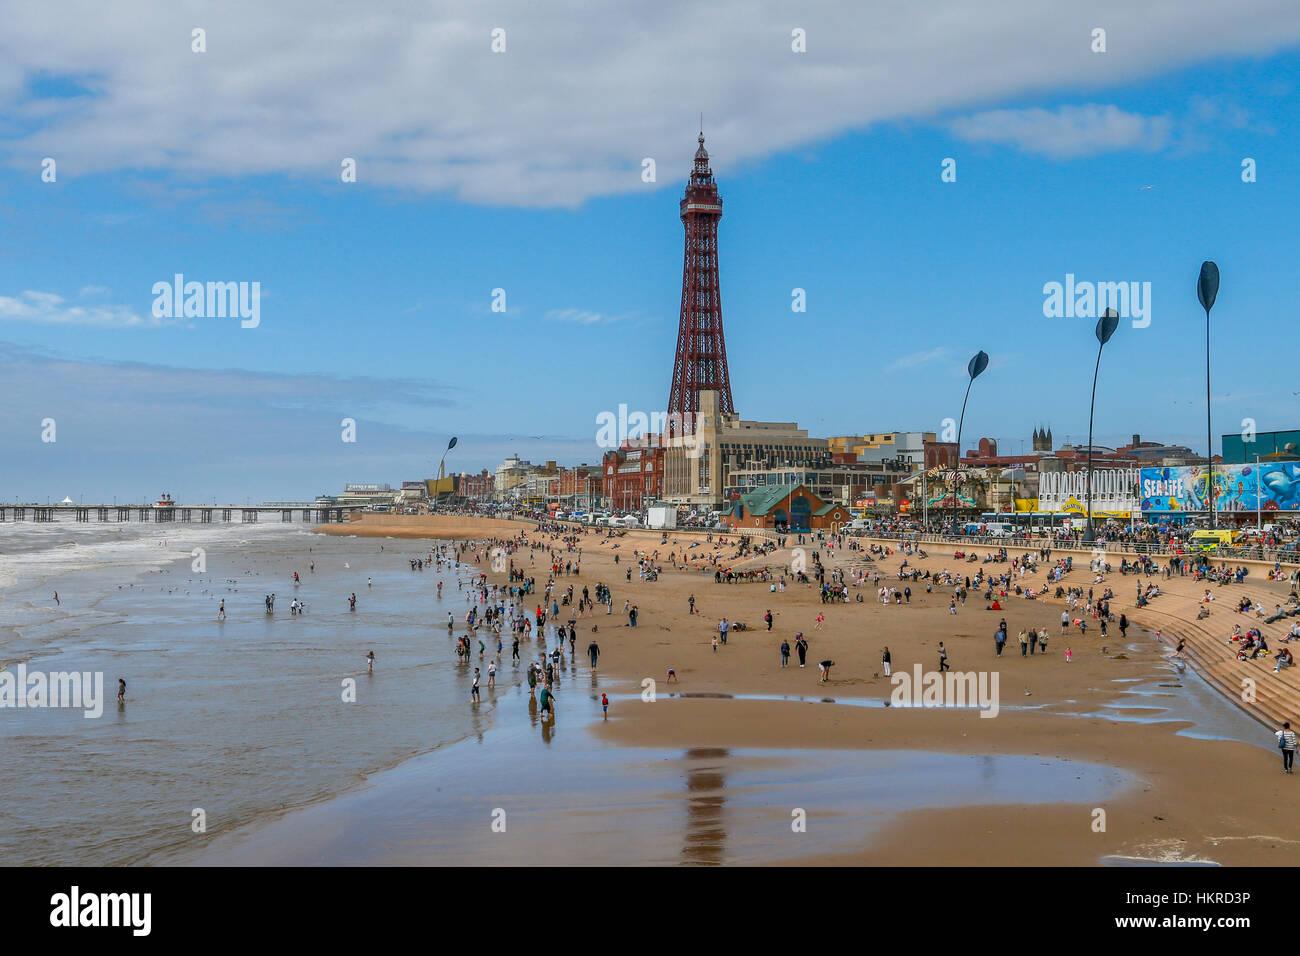 Blackpool sea front and Tower, Blackpool, Lancashire, England. - Stock Image